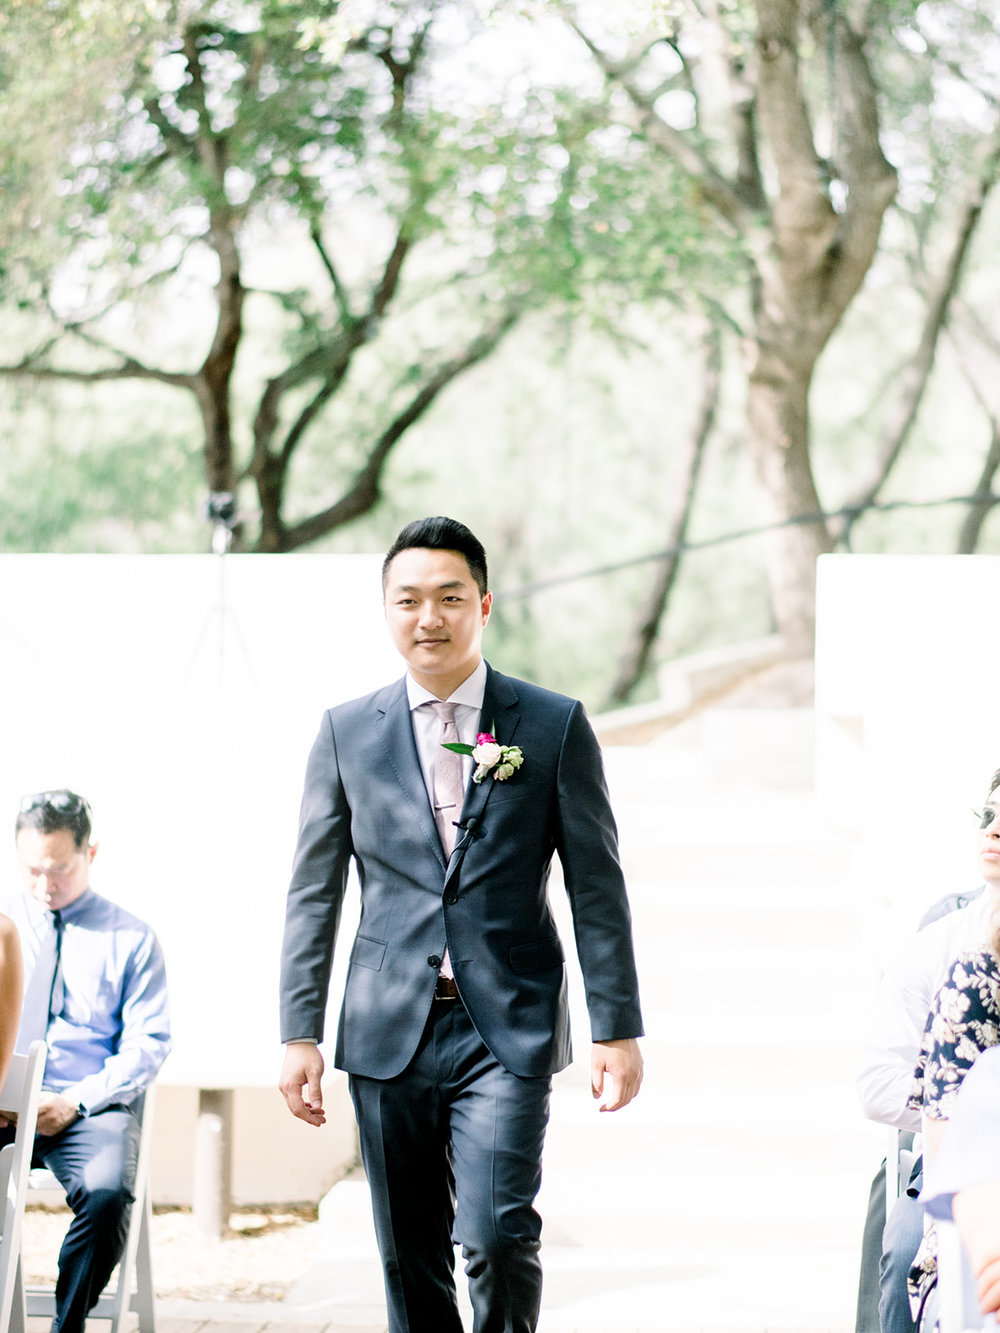 jueunandjon-etherandsmith-wedding-669.jpg